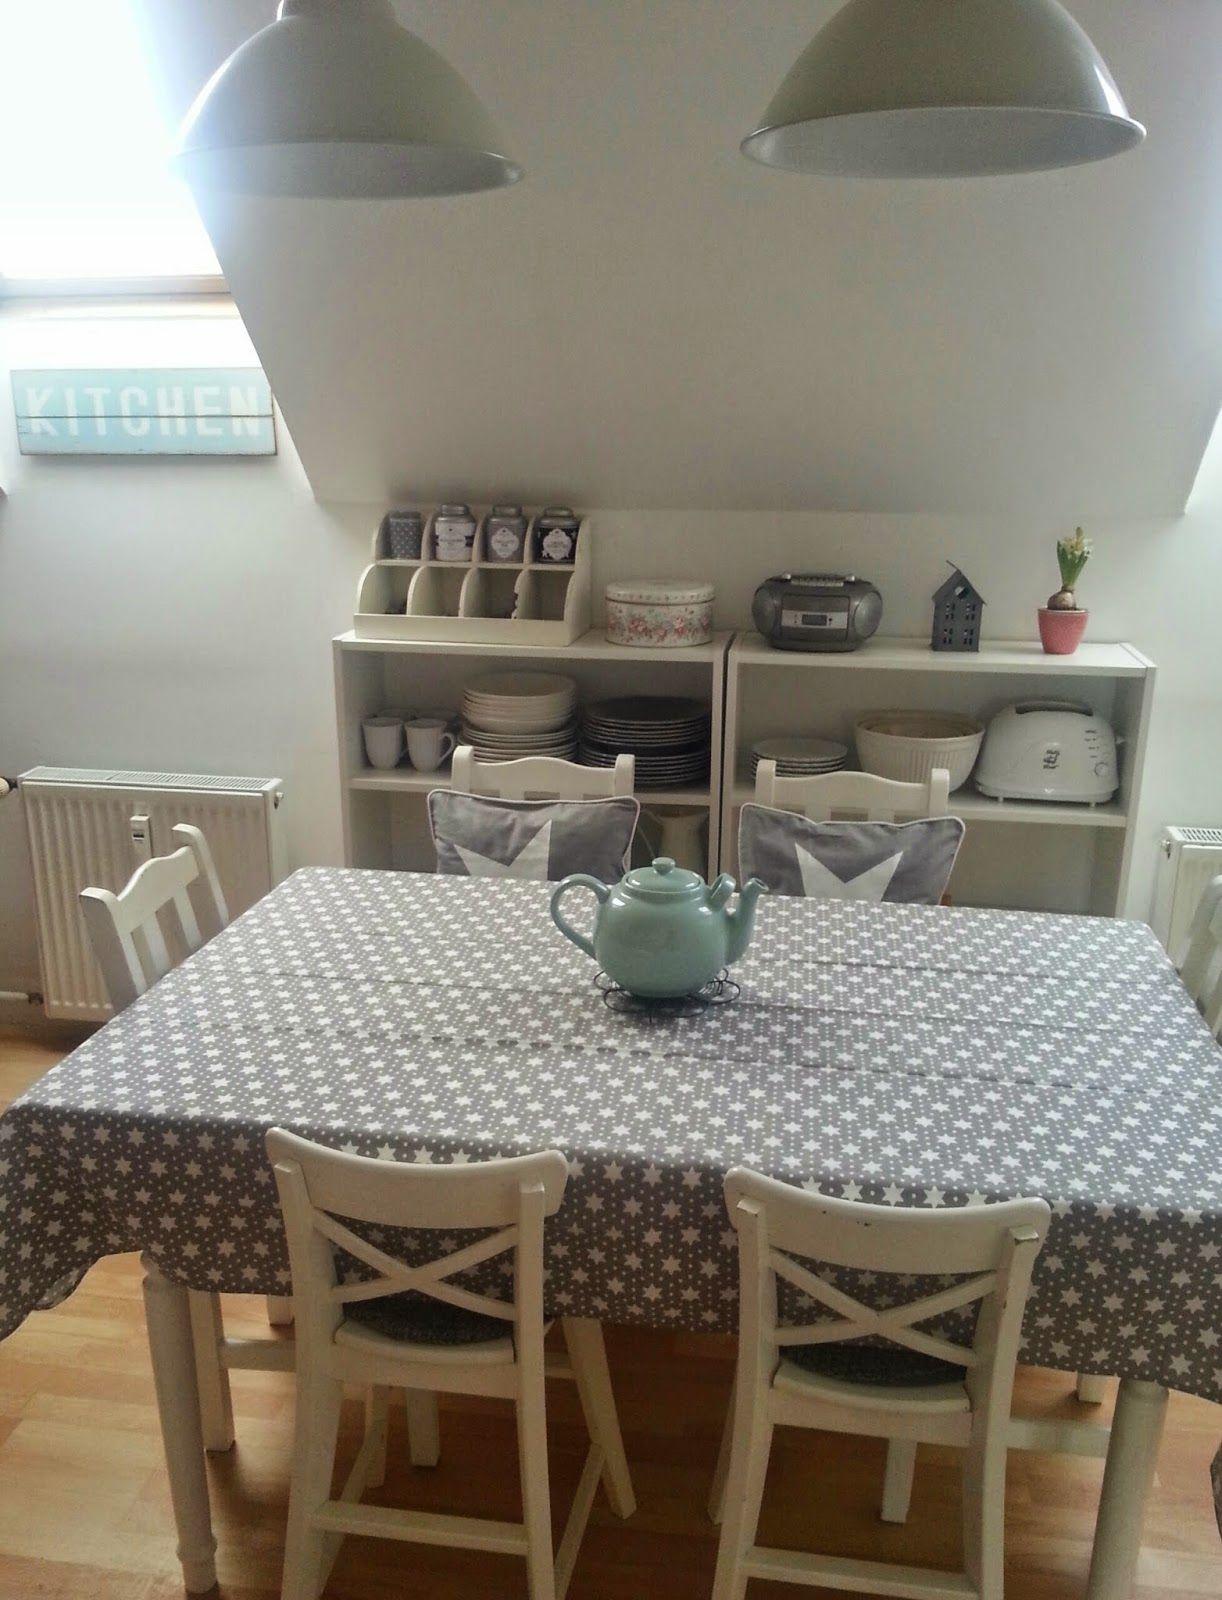 Z Potrzeby Bieli Home Decor Dining Table Furniture